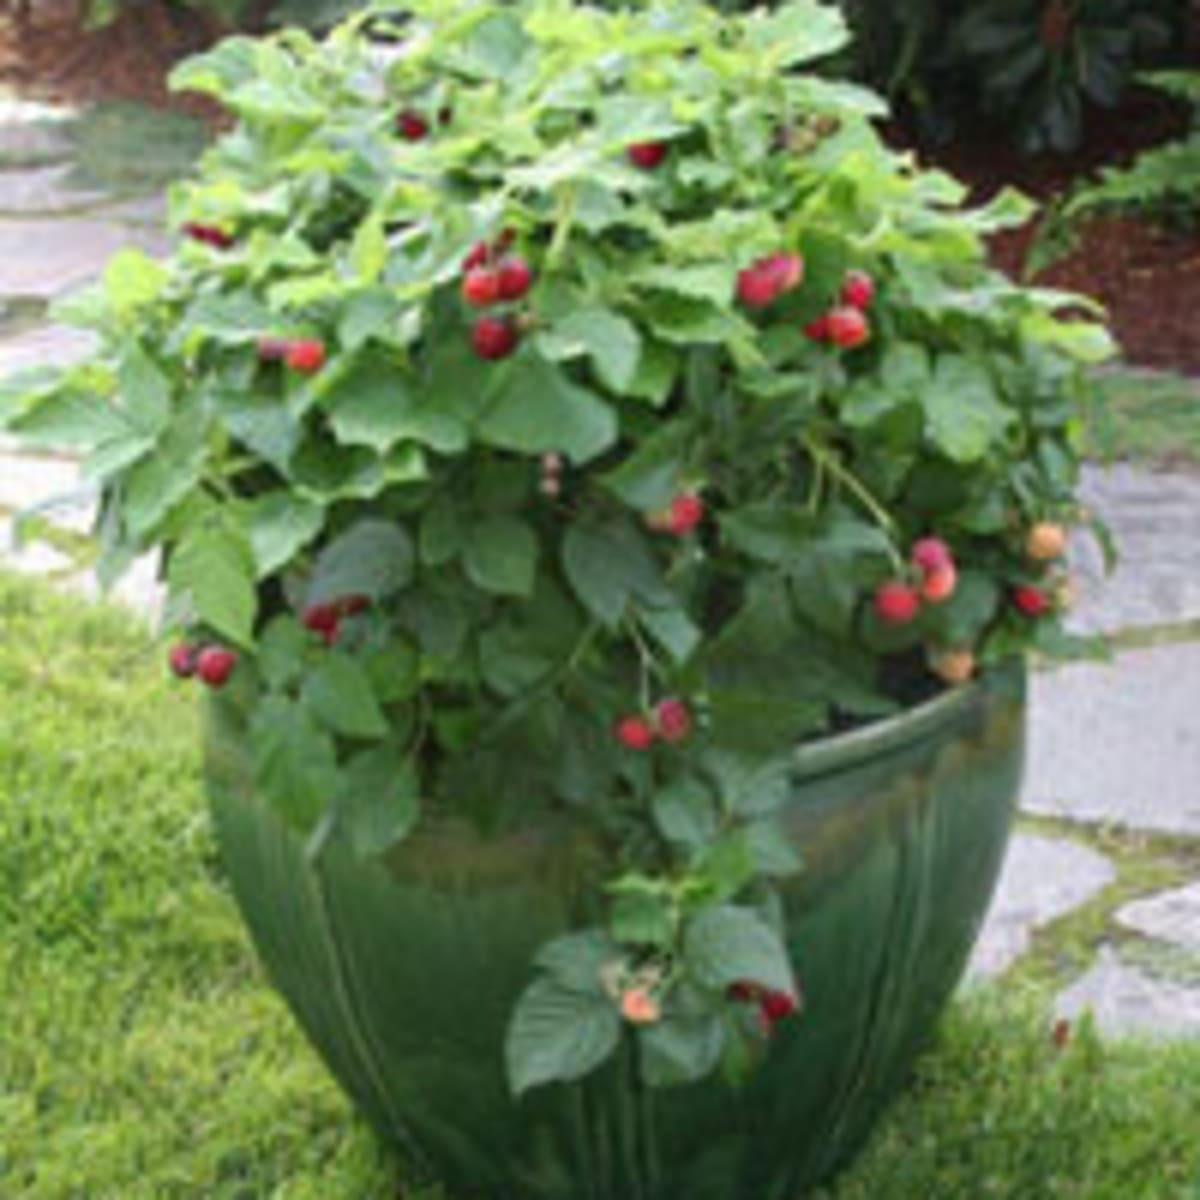 Pruning Raspberry Shortcake Dwarf Raspberry Horticulture